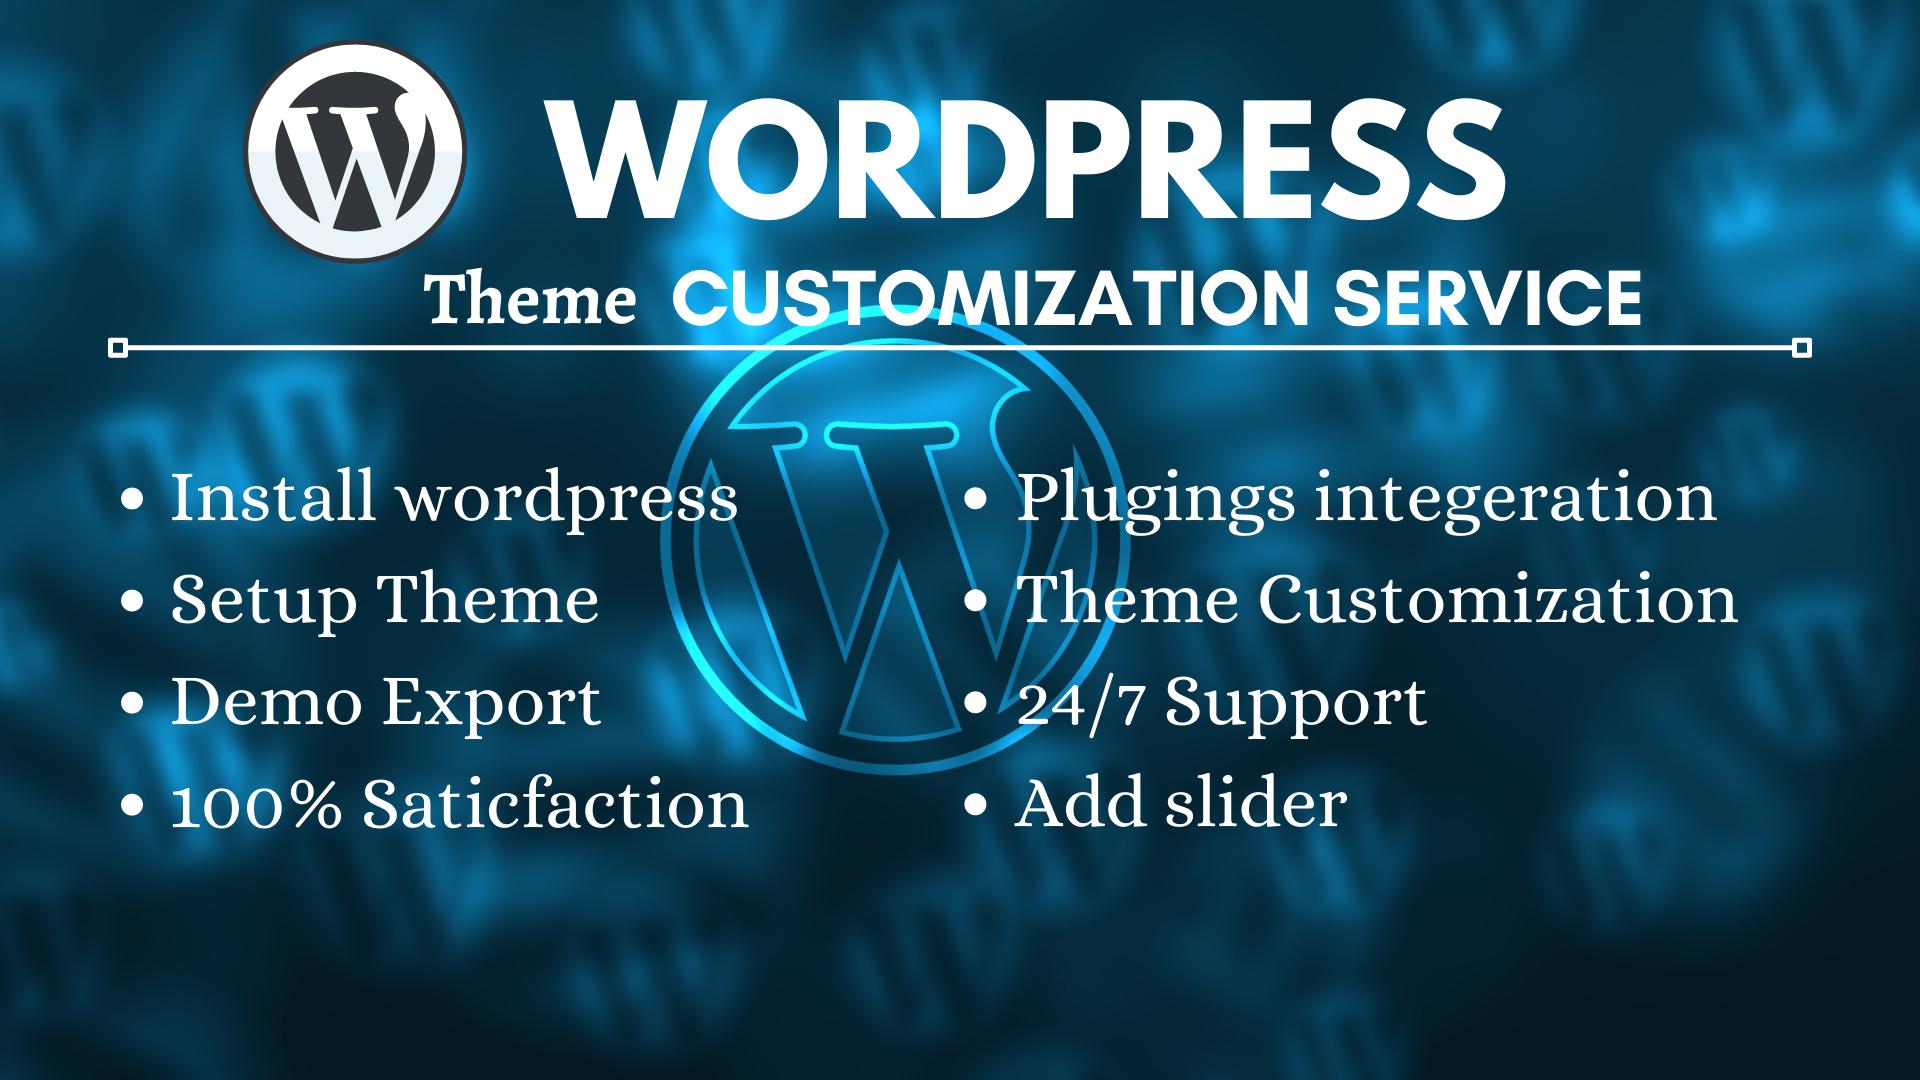 I will customize any wordoress theme